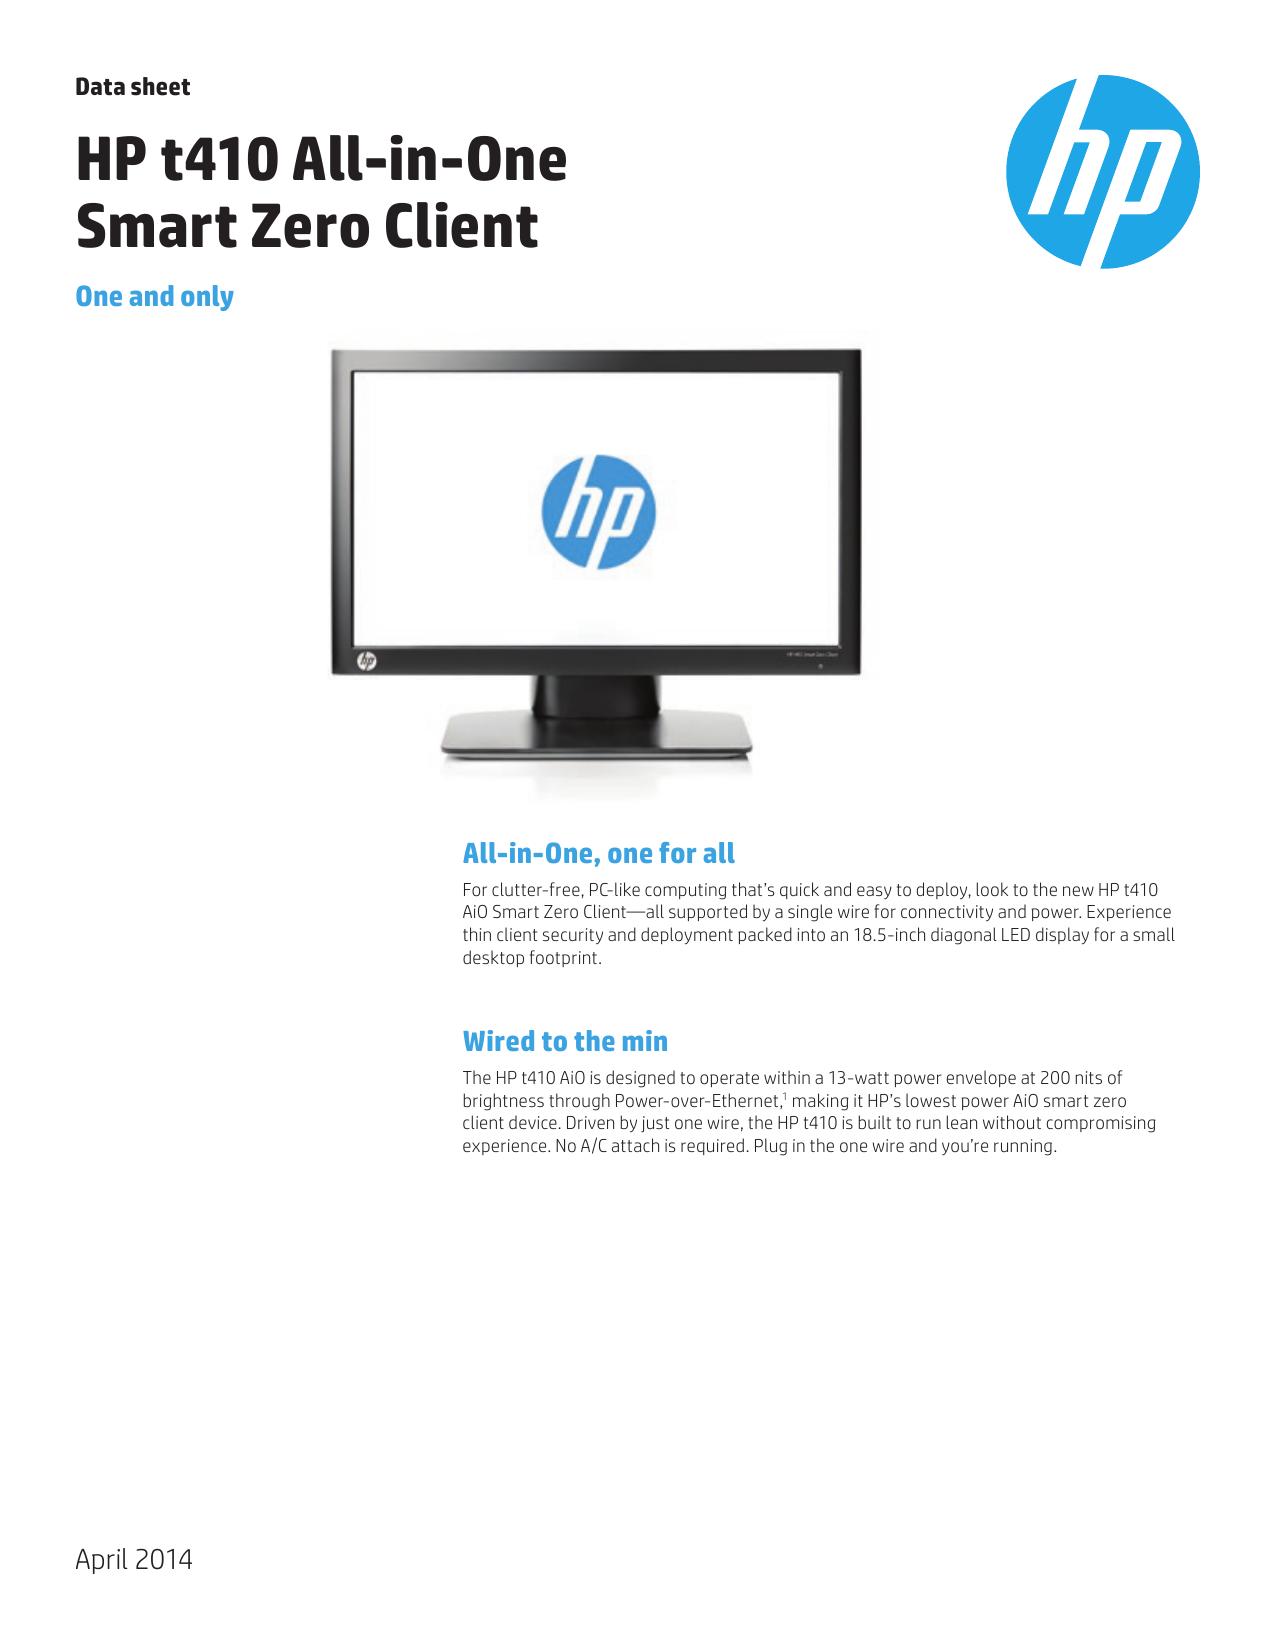 HP t410 All-in-One Smart Zero Client   manualzz com